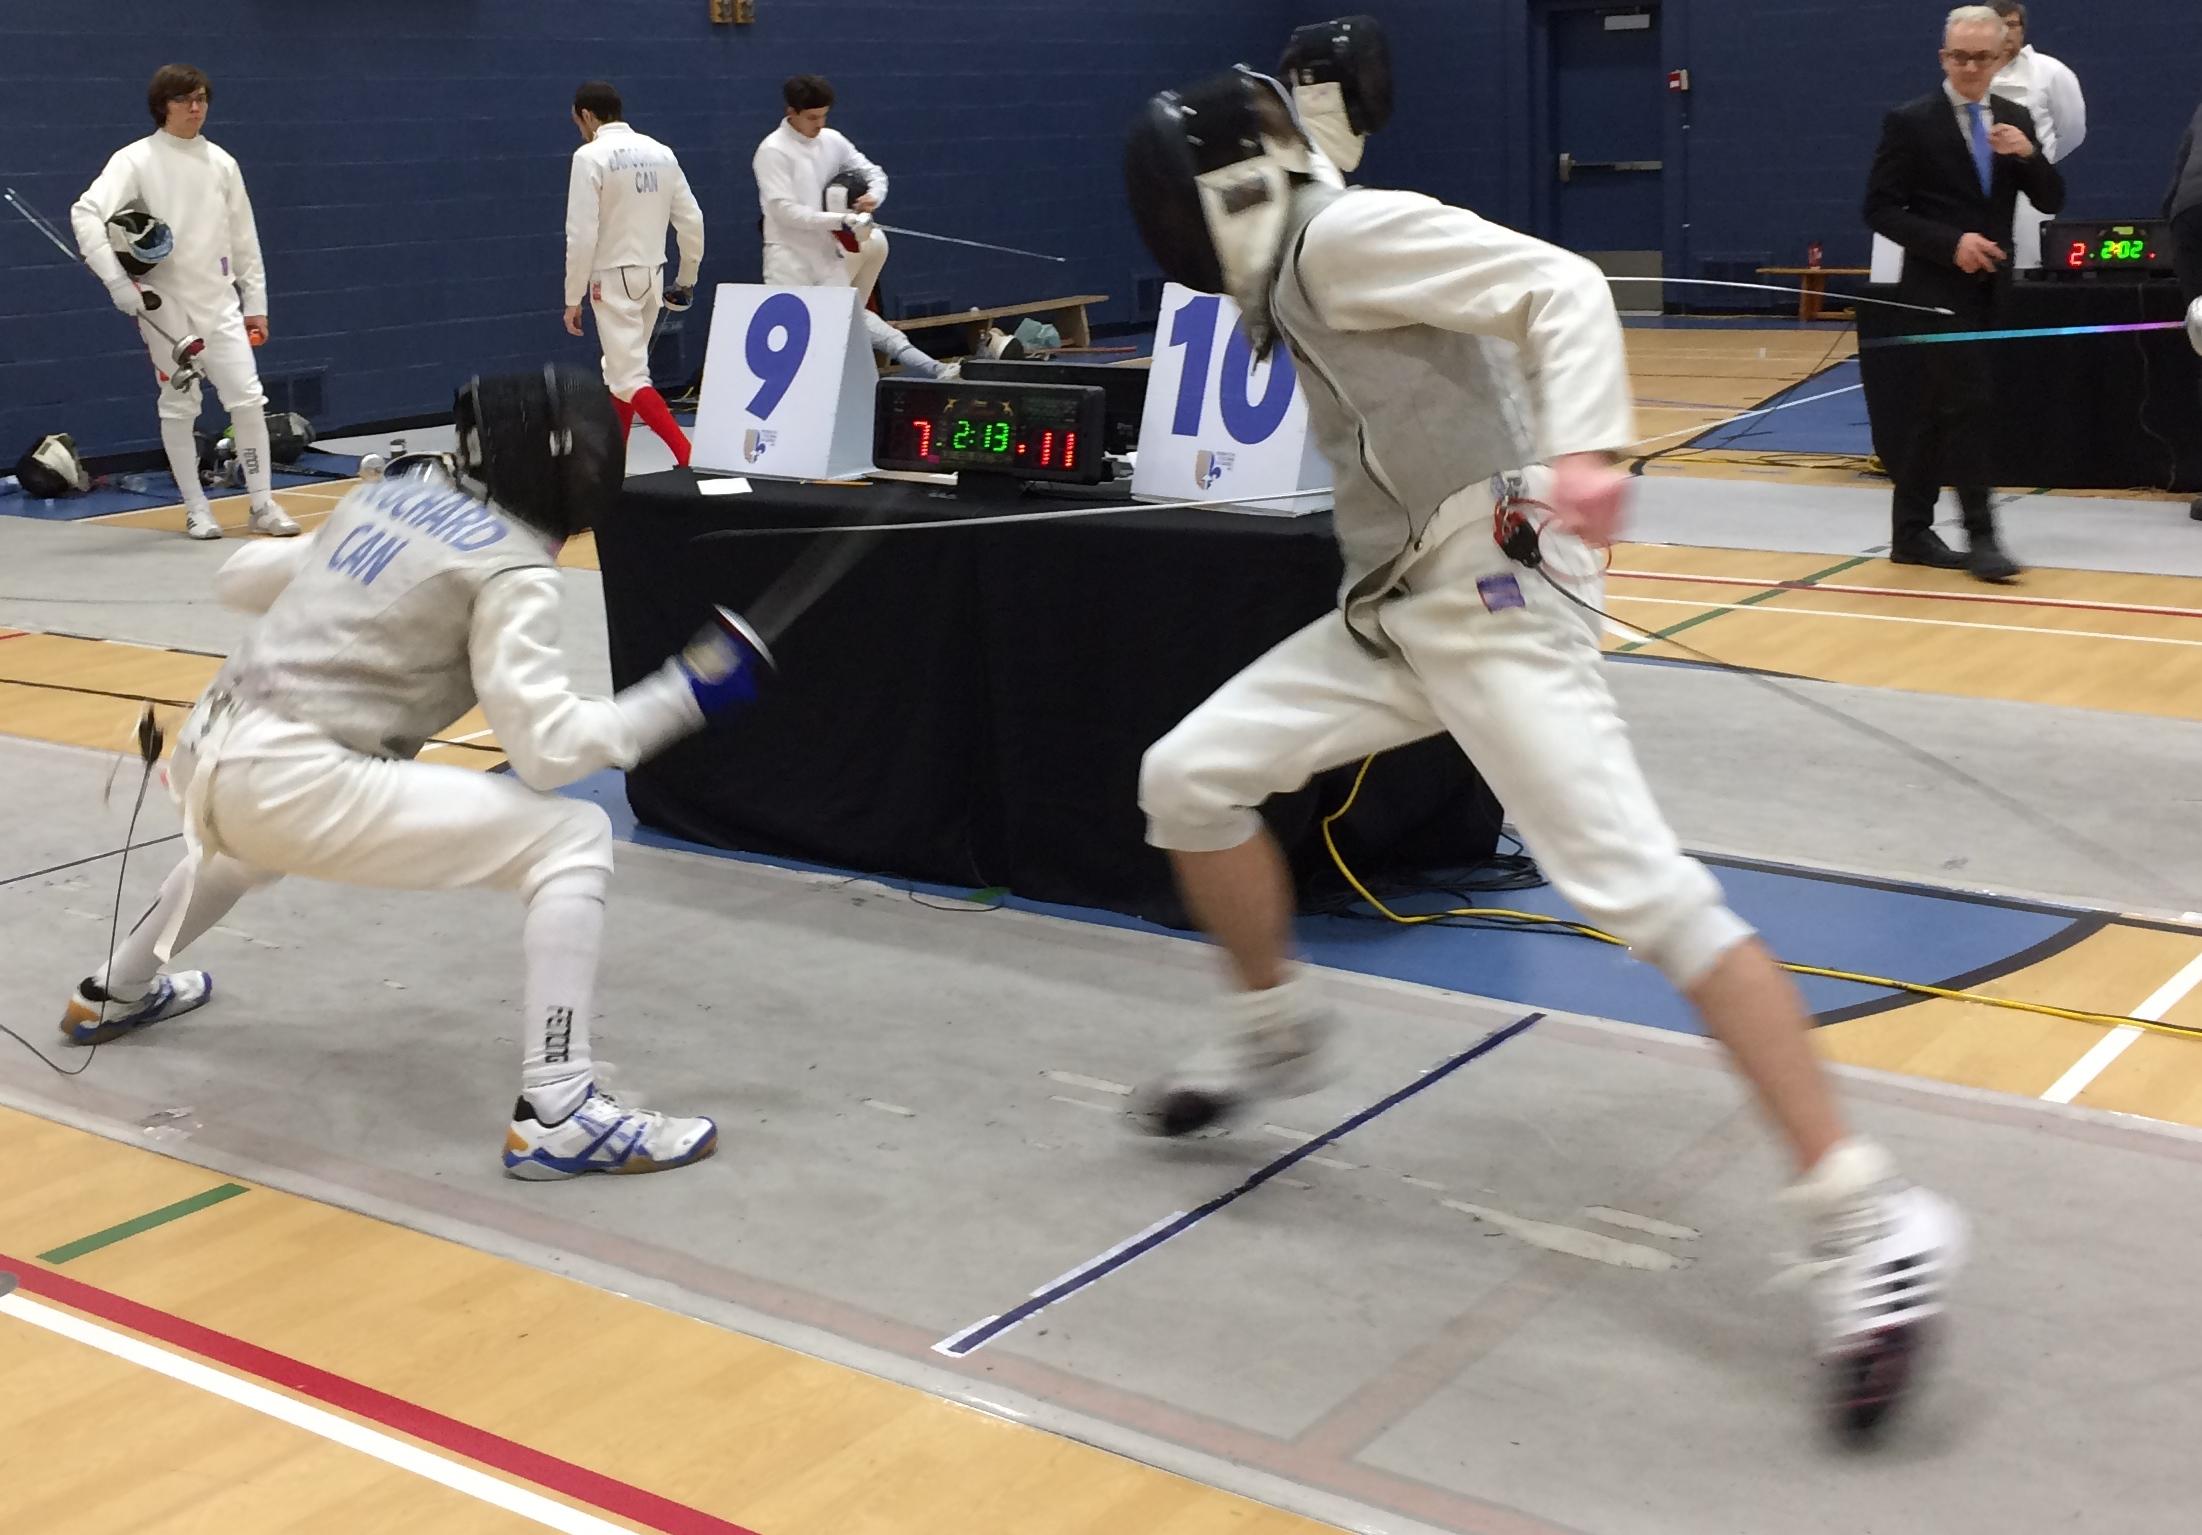 2017-01-21 Francis Bouchard et Julien Biet en combat